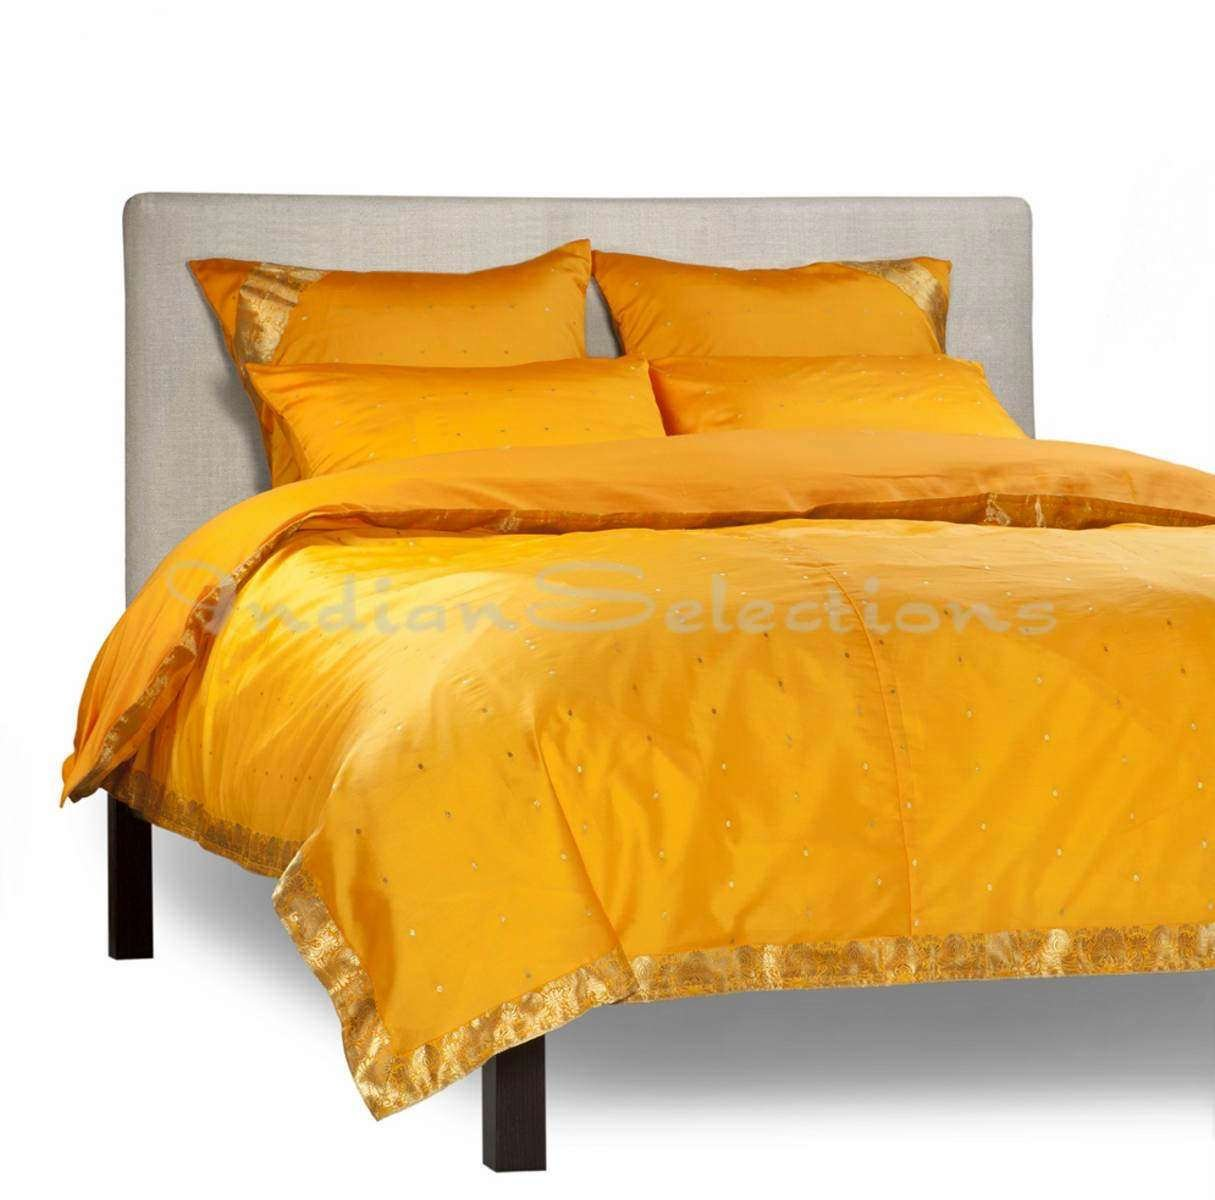 Pumpkin - 5 Piece Handmade Sari Duvet Cover Set with Pillow Covers / Euro Sham - Twin